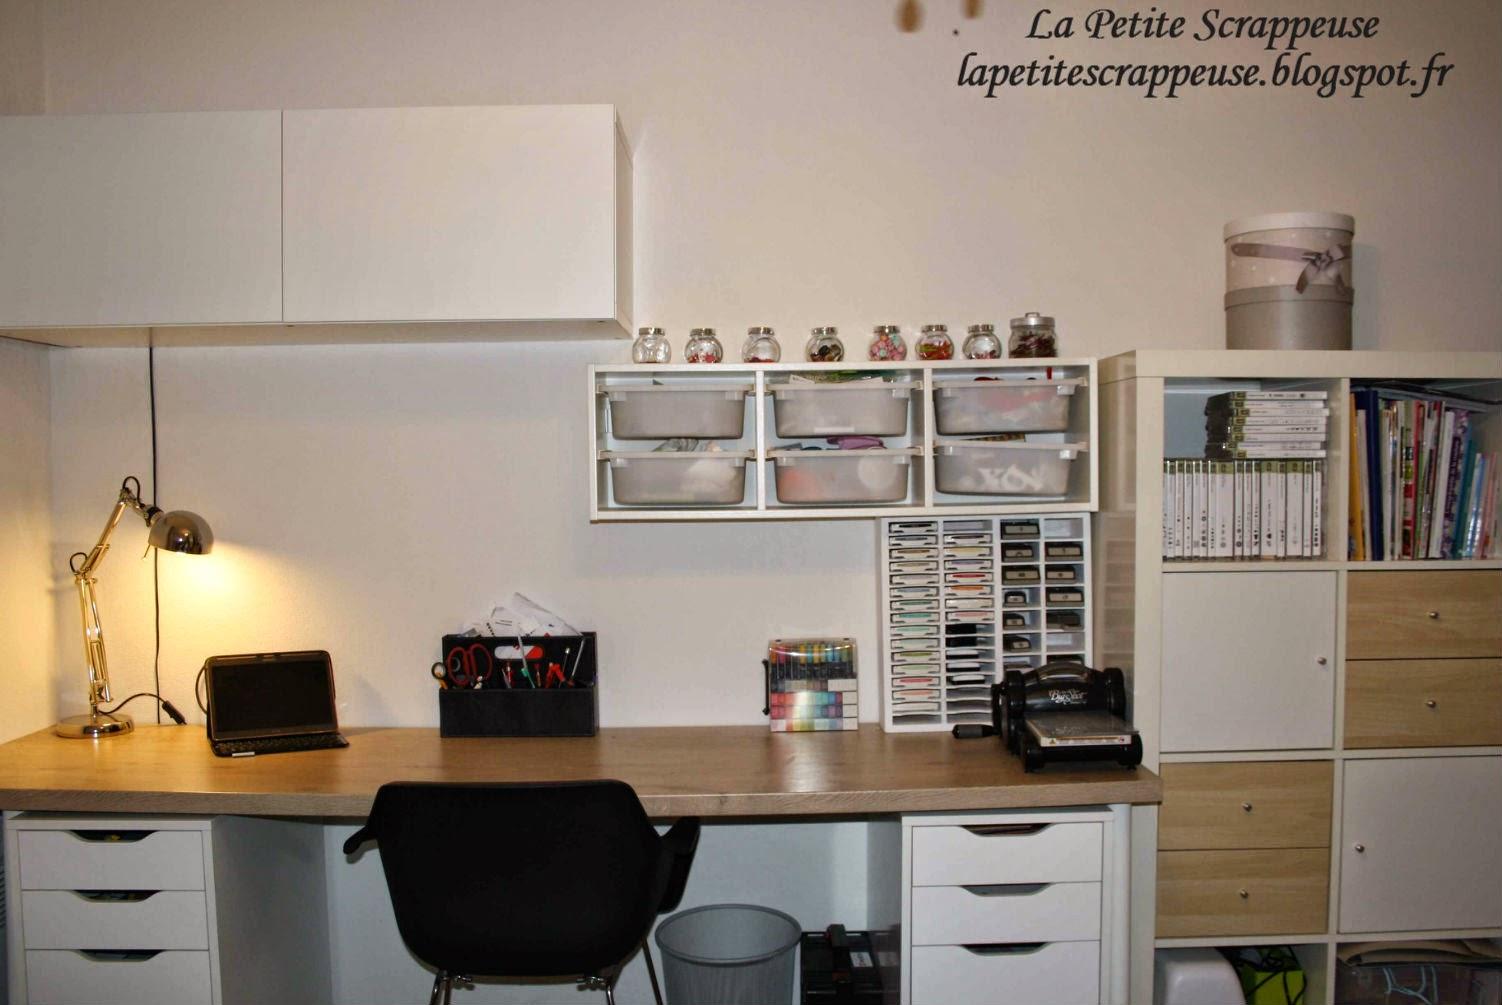 la petite scrappeuse visite de ma scraproom. Black Bedroom Furniture Sets. Home Design Ideas